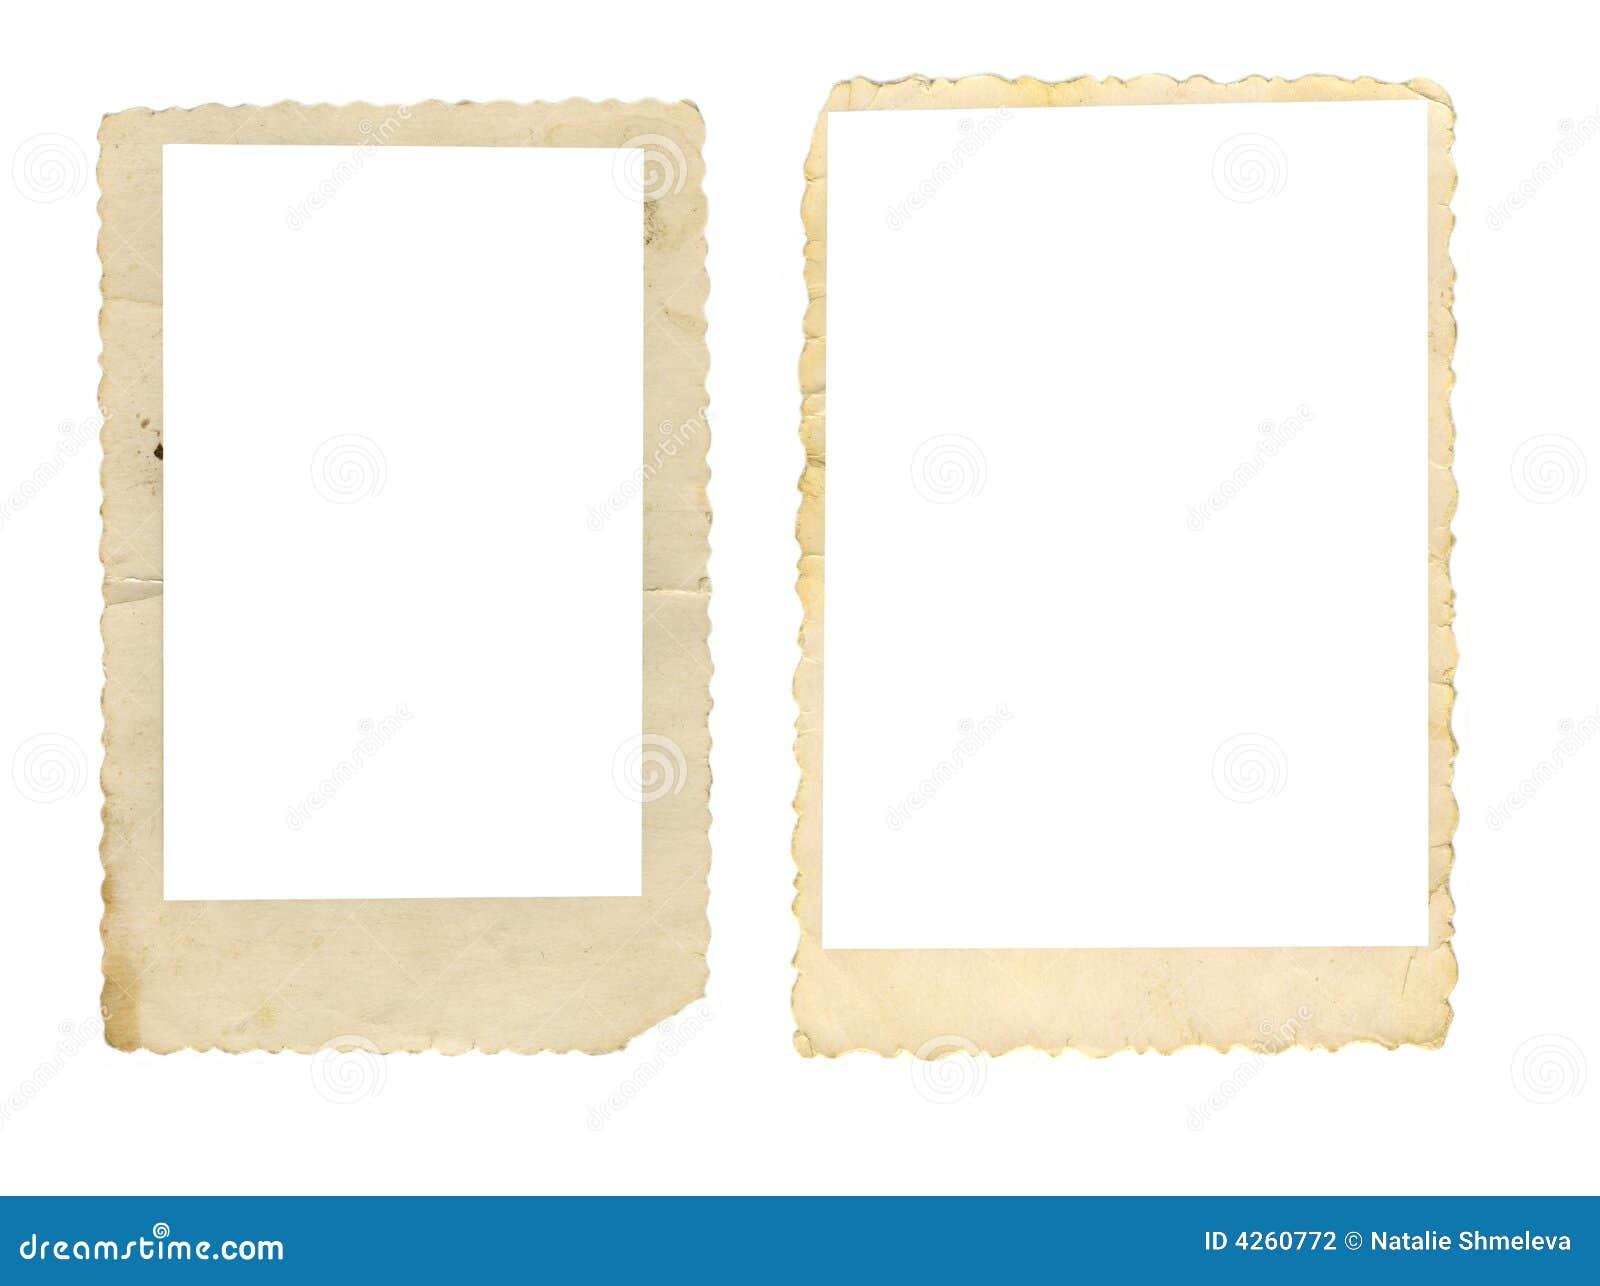 Old photo frame stock image. Image of captured, portrait - 6909967